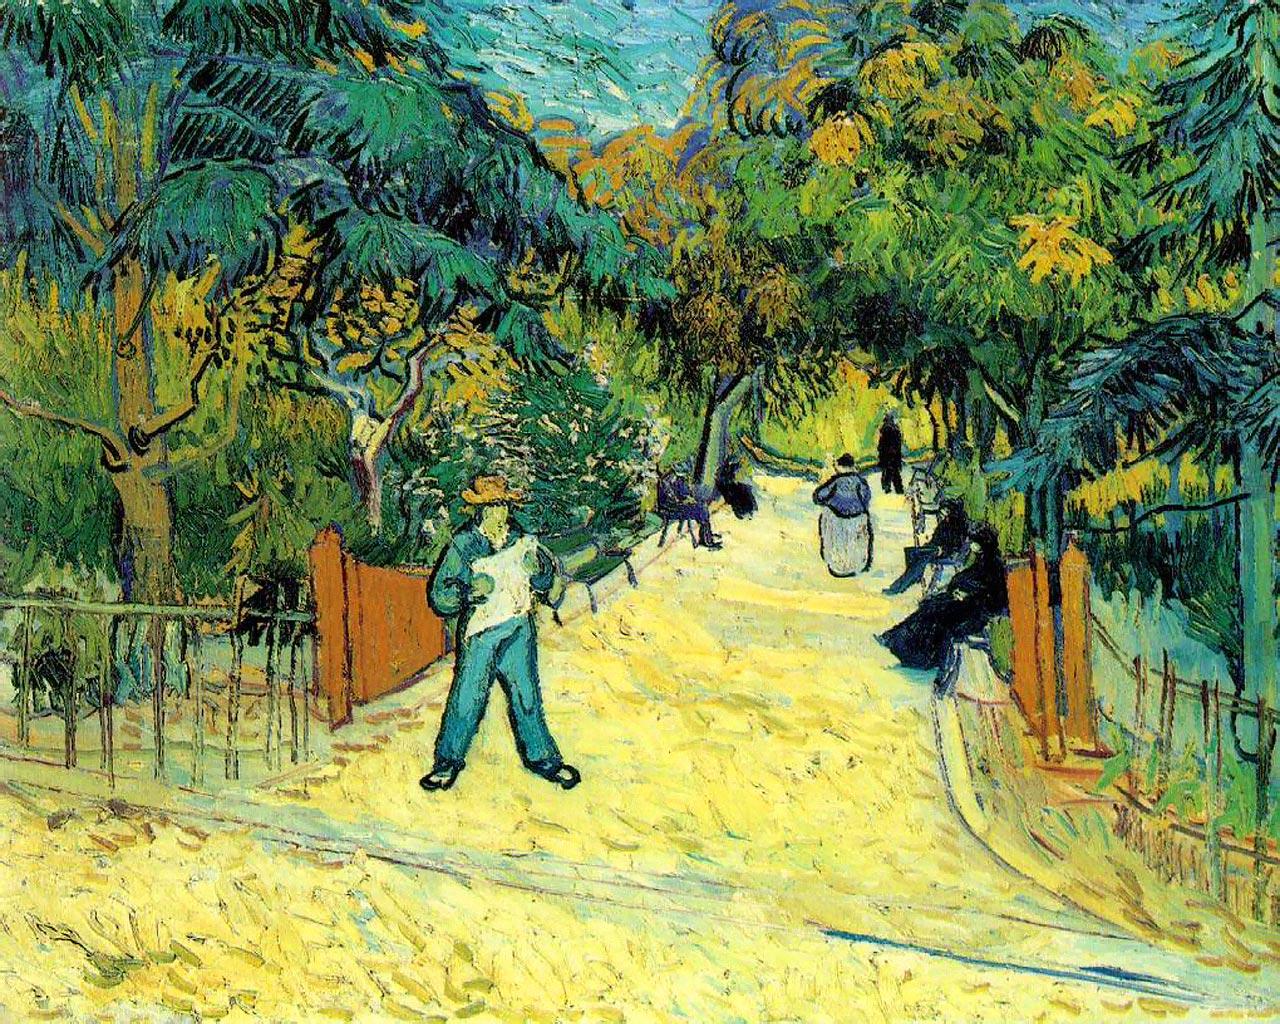 Van-Gogh-fine-art-692306_1280_1024.jpg